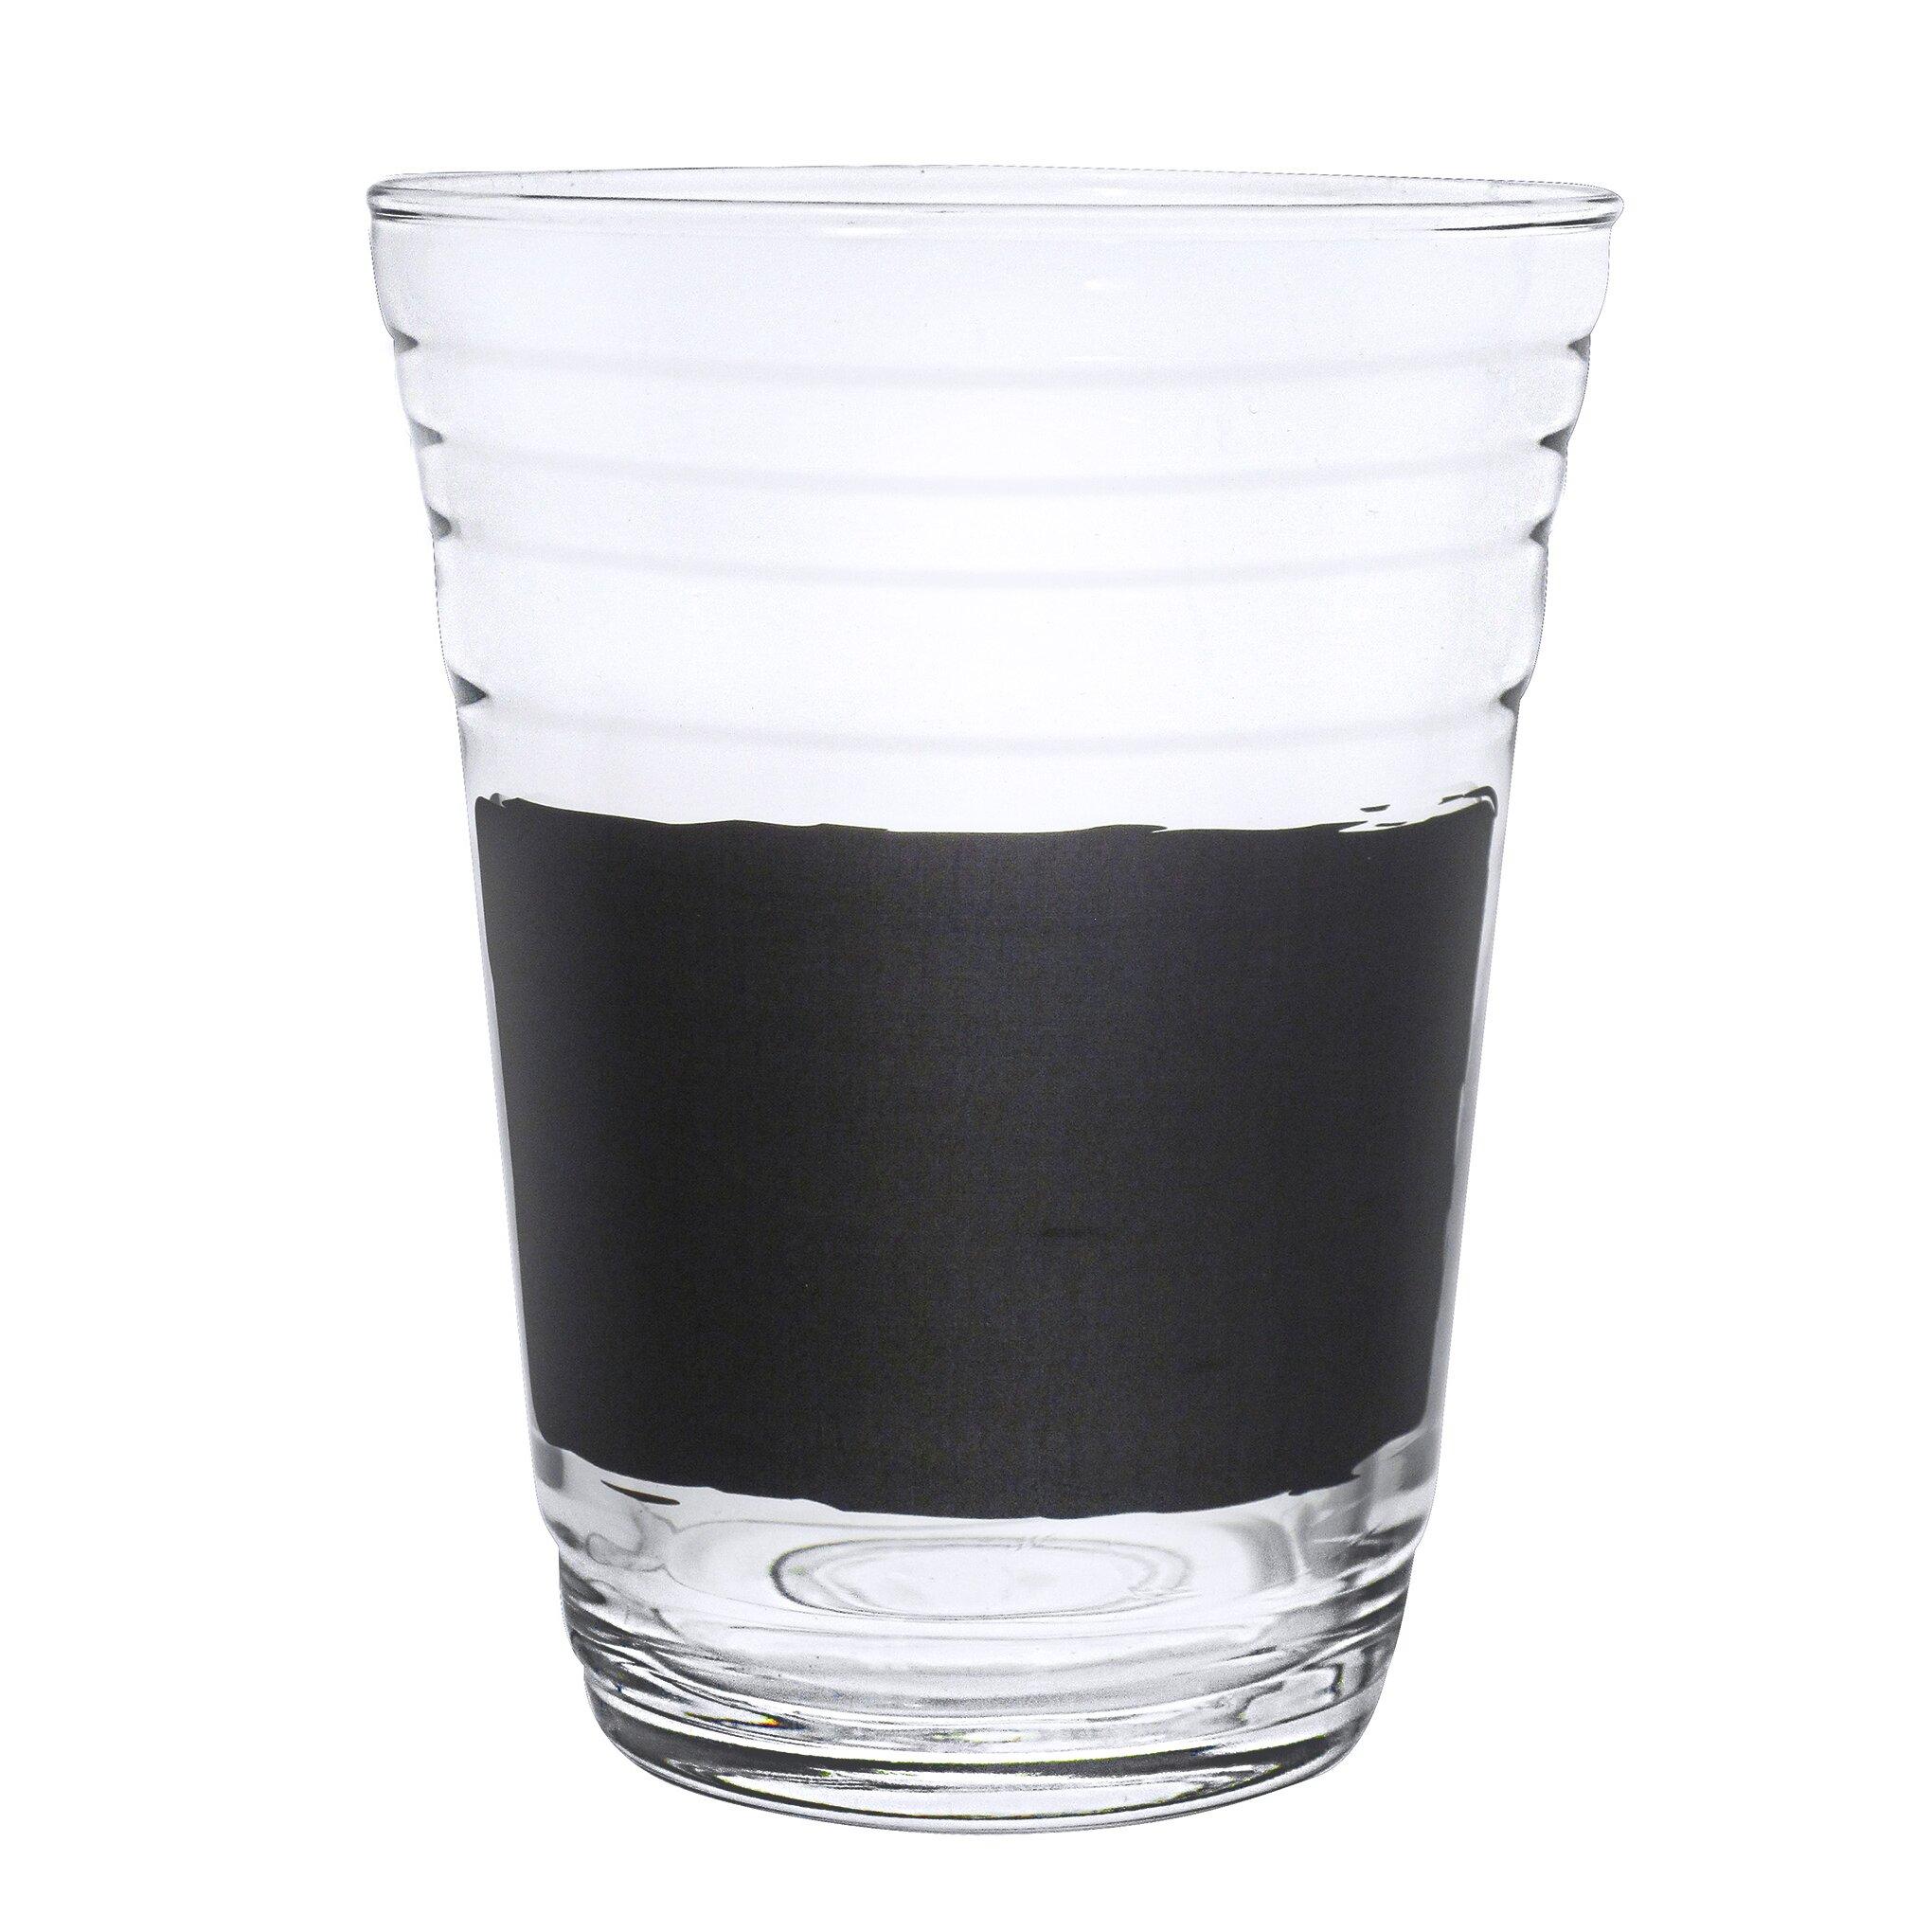 luminarc 16 oz specialty drink glass reviews wayfair. Black Bedroom Furniture Sets. Home Design Ideas